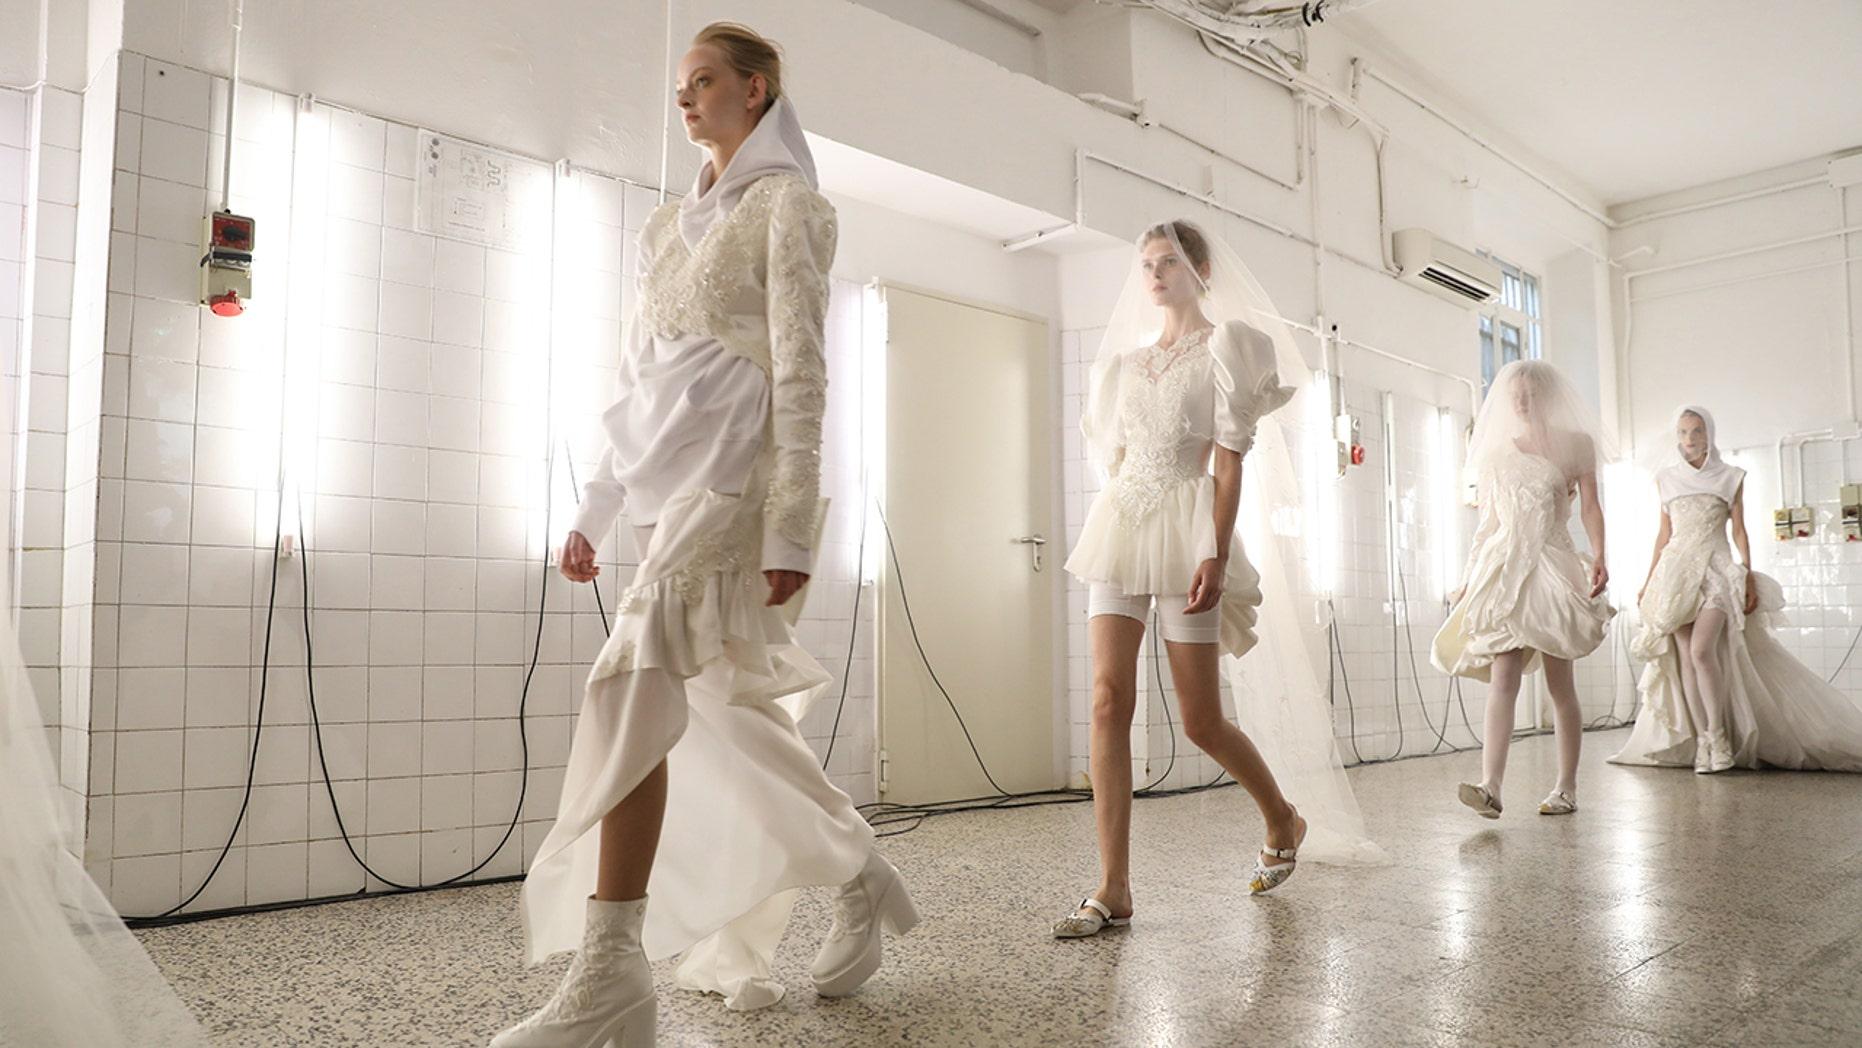 A.F. Vandevorst's show showcased several gym-ready wedding looks.